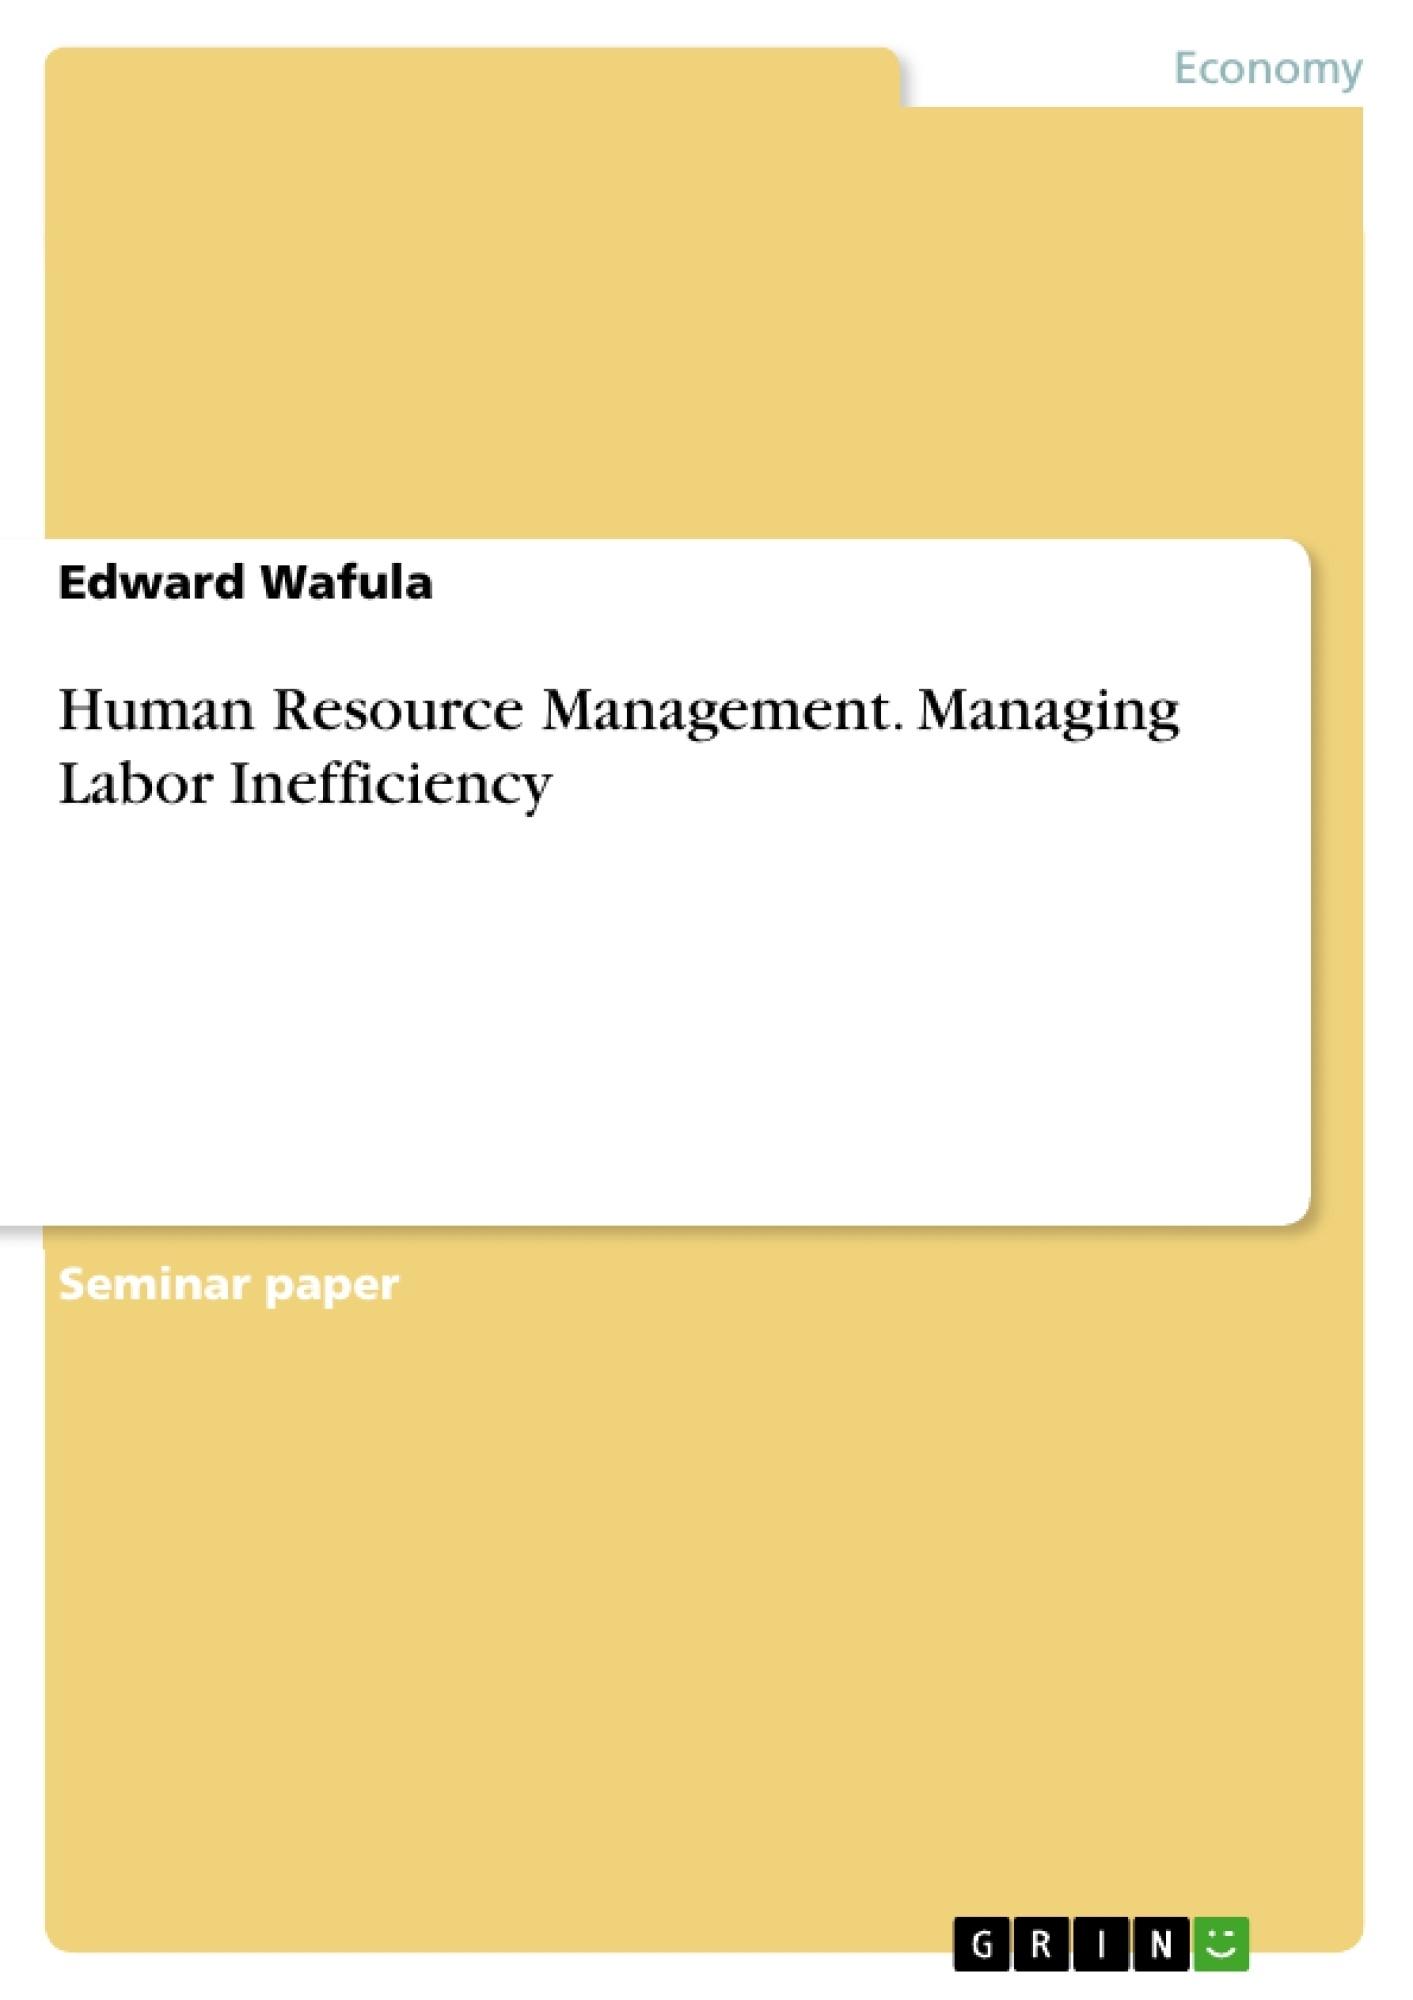 Title: Human Resource Management. Managing Labor Inefficiency